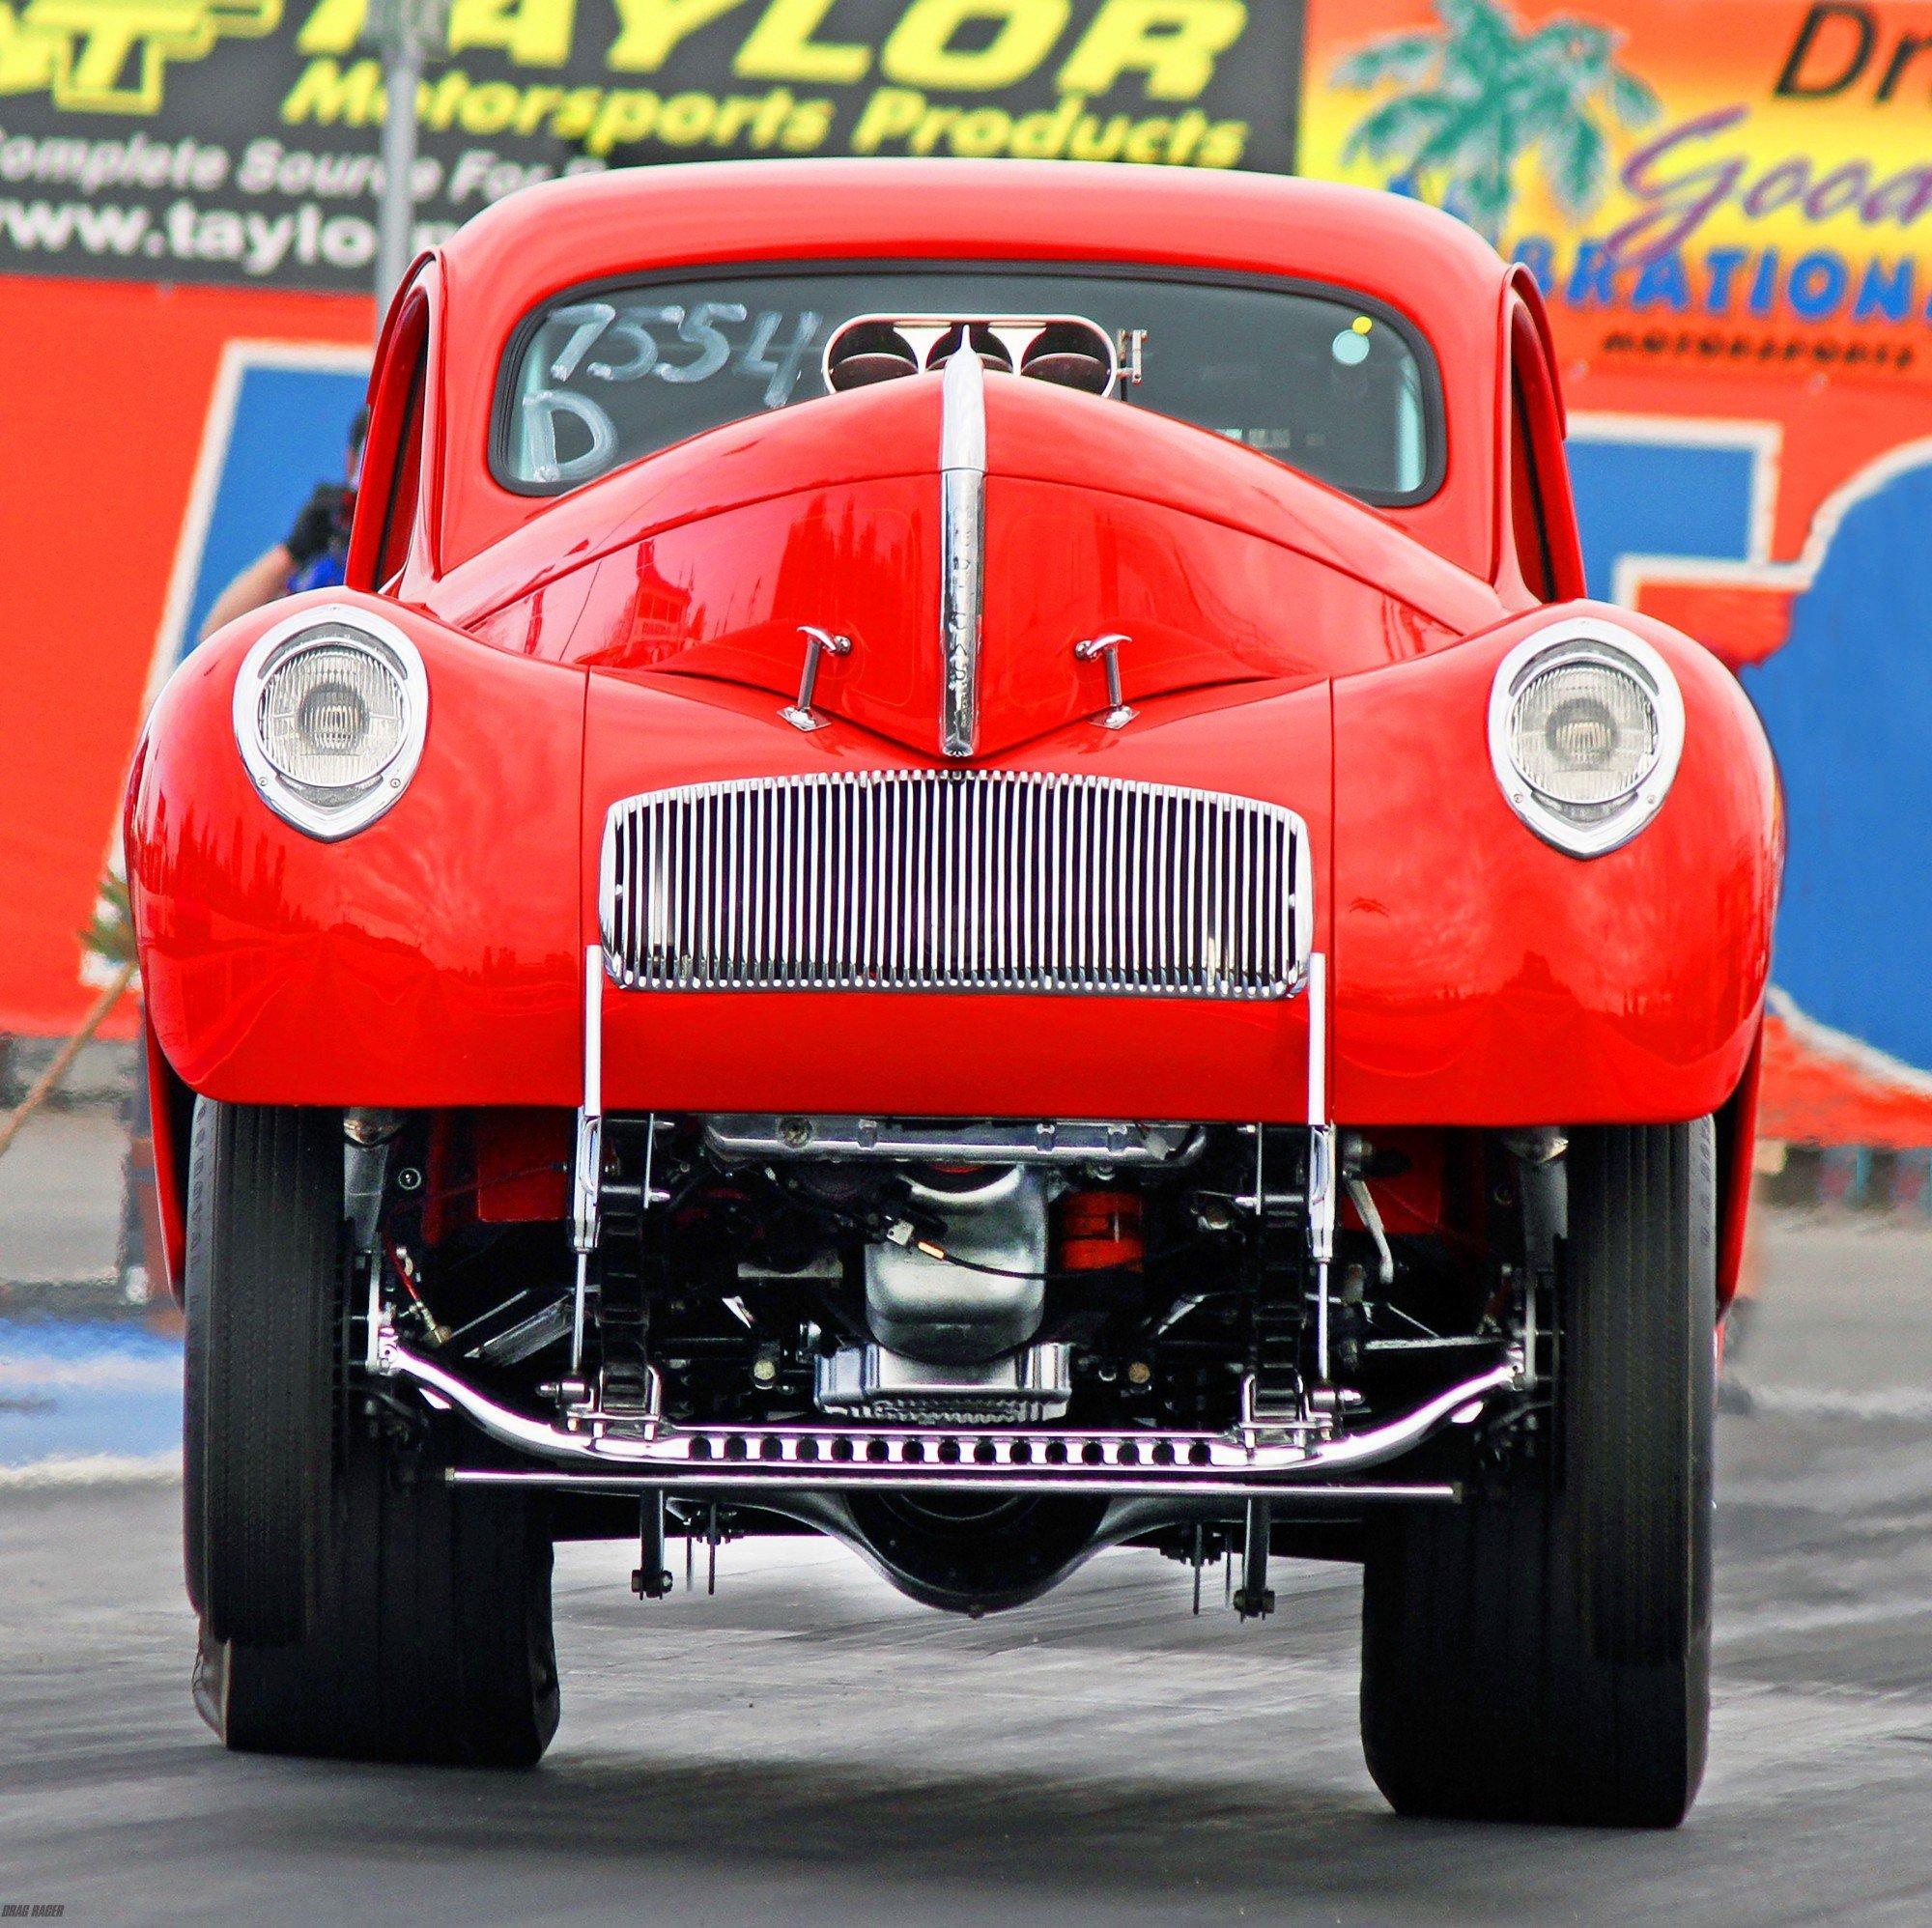 DRAG RACING Hot Rod Rods Race Willys Gasser F Wallpaper